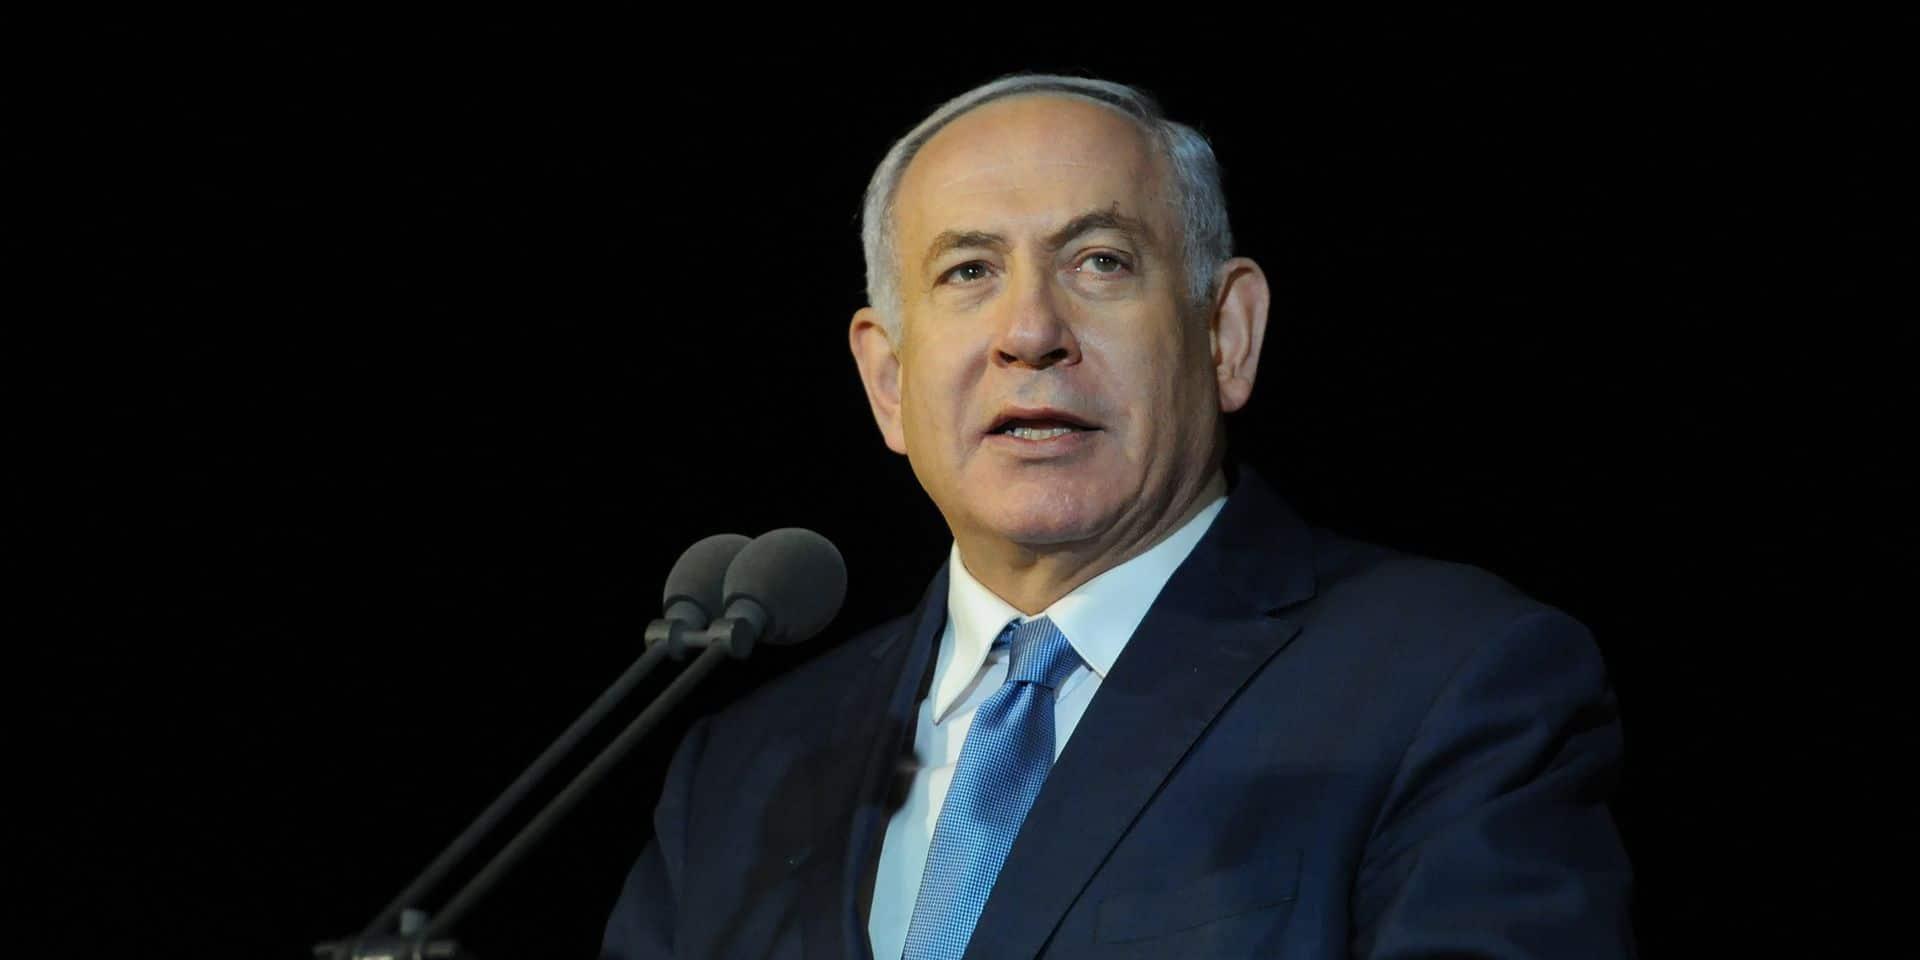 ISRAEL HAIFA NETANYAHU NAVY CADETS GRADUATION